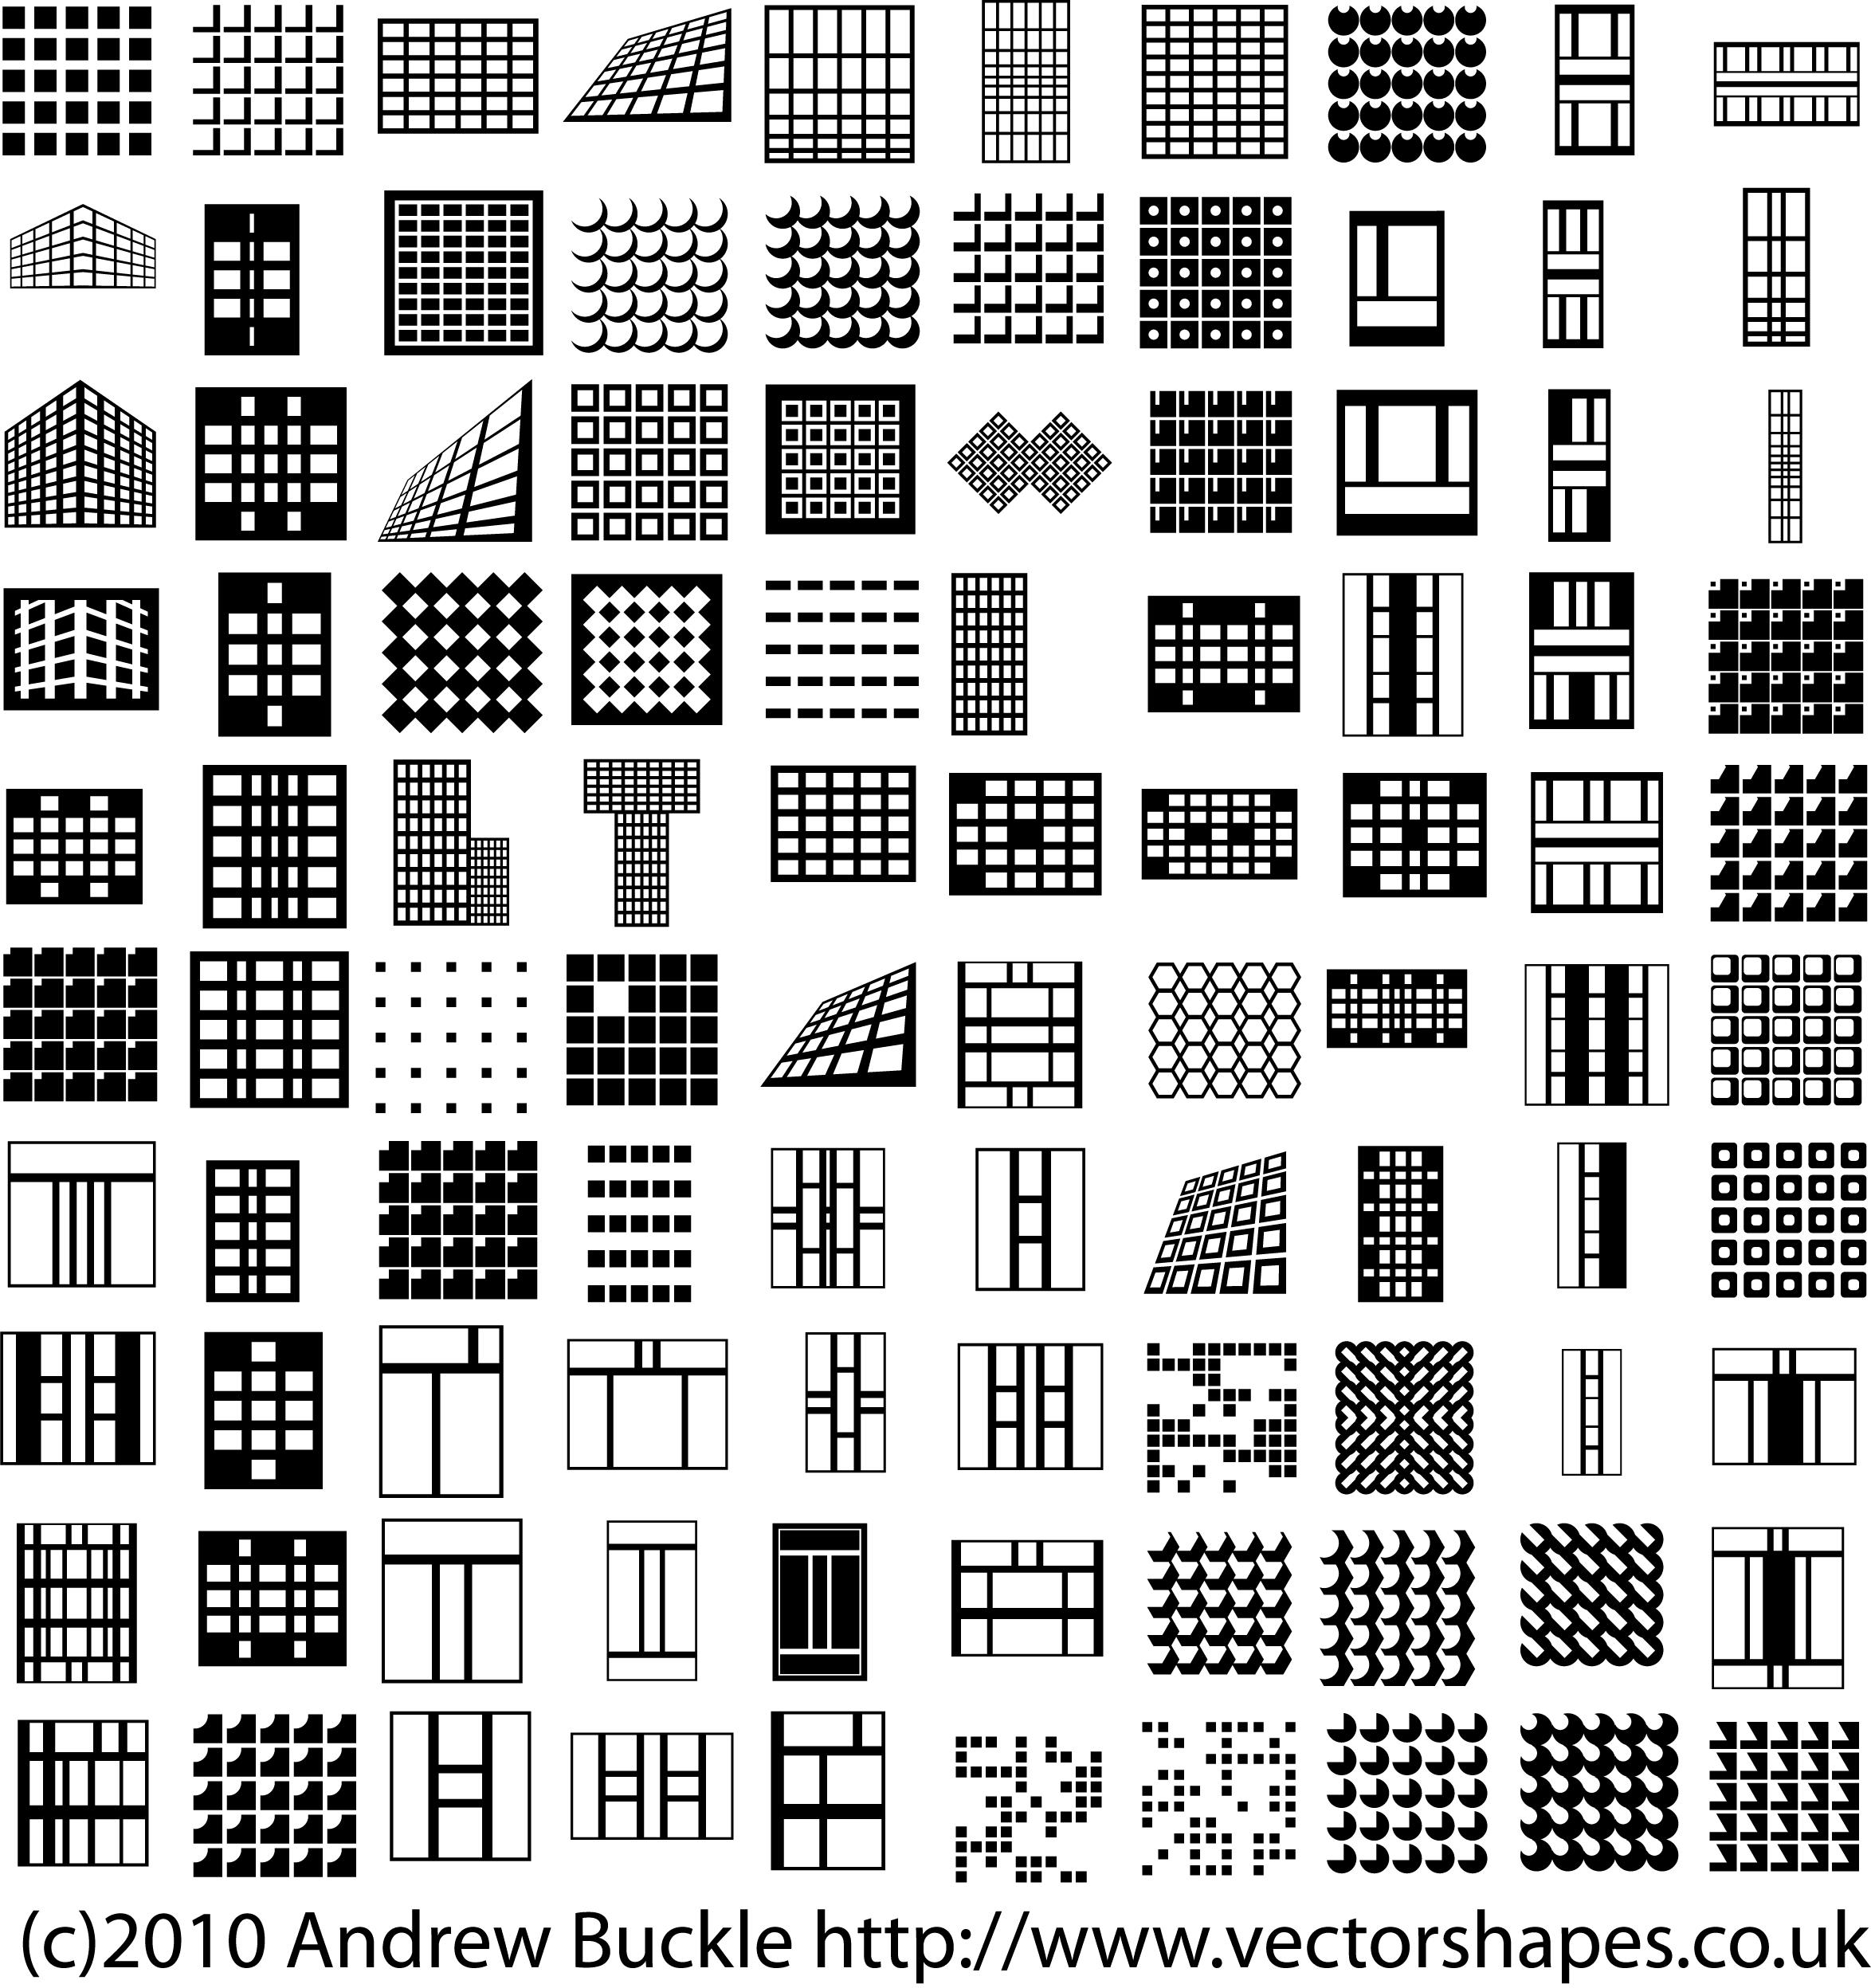 Animate flash symbols for Table grid design